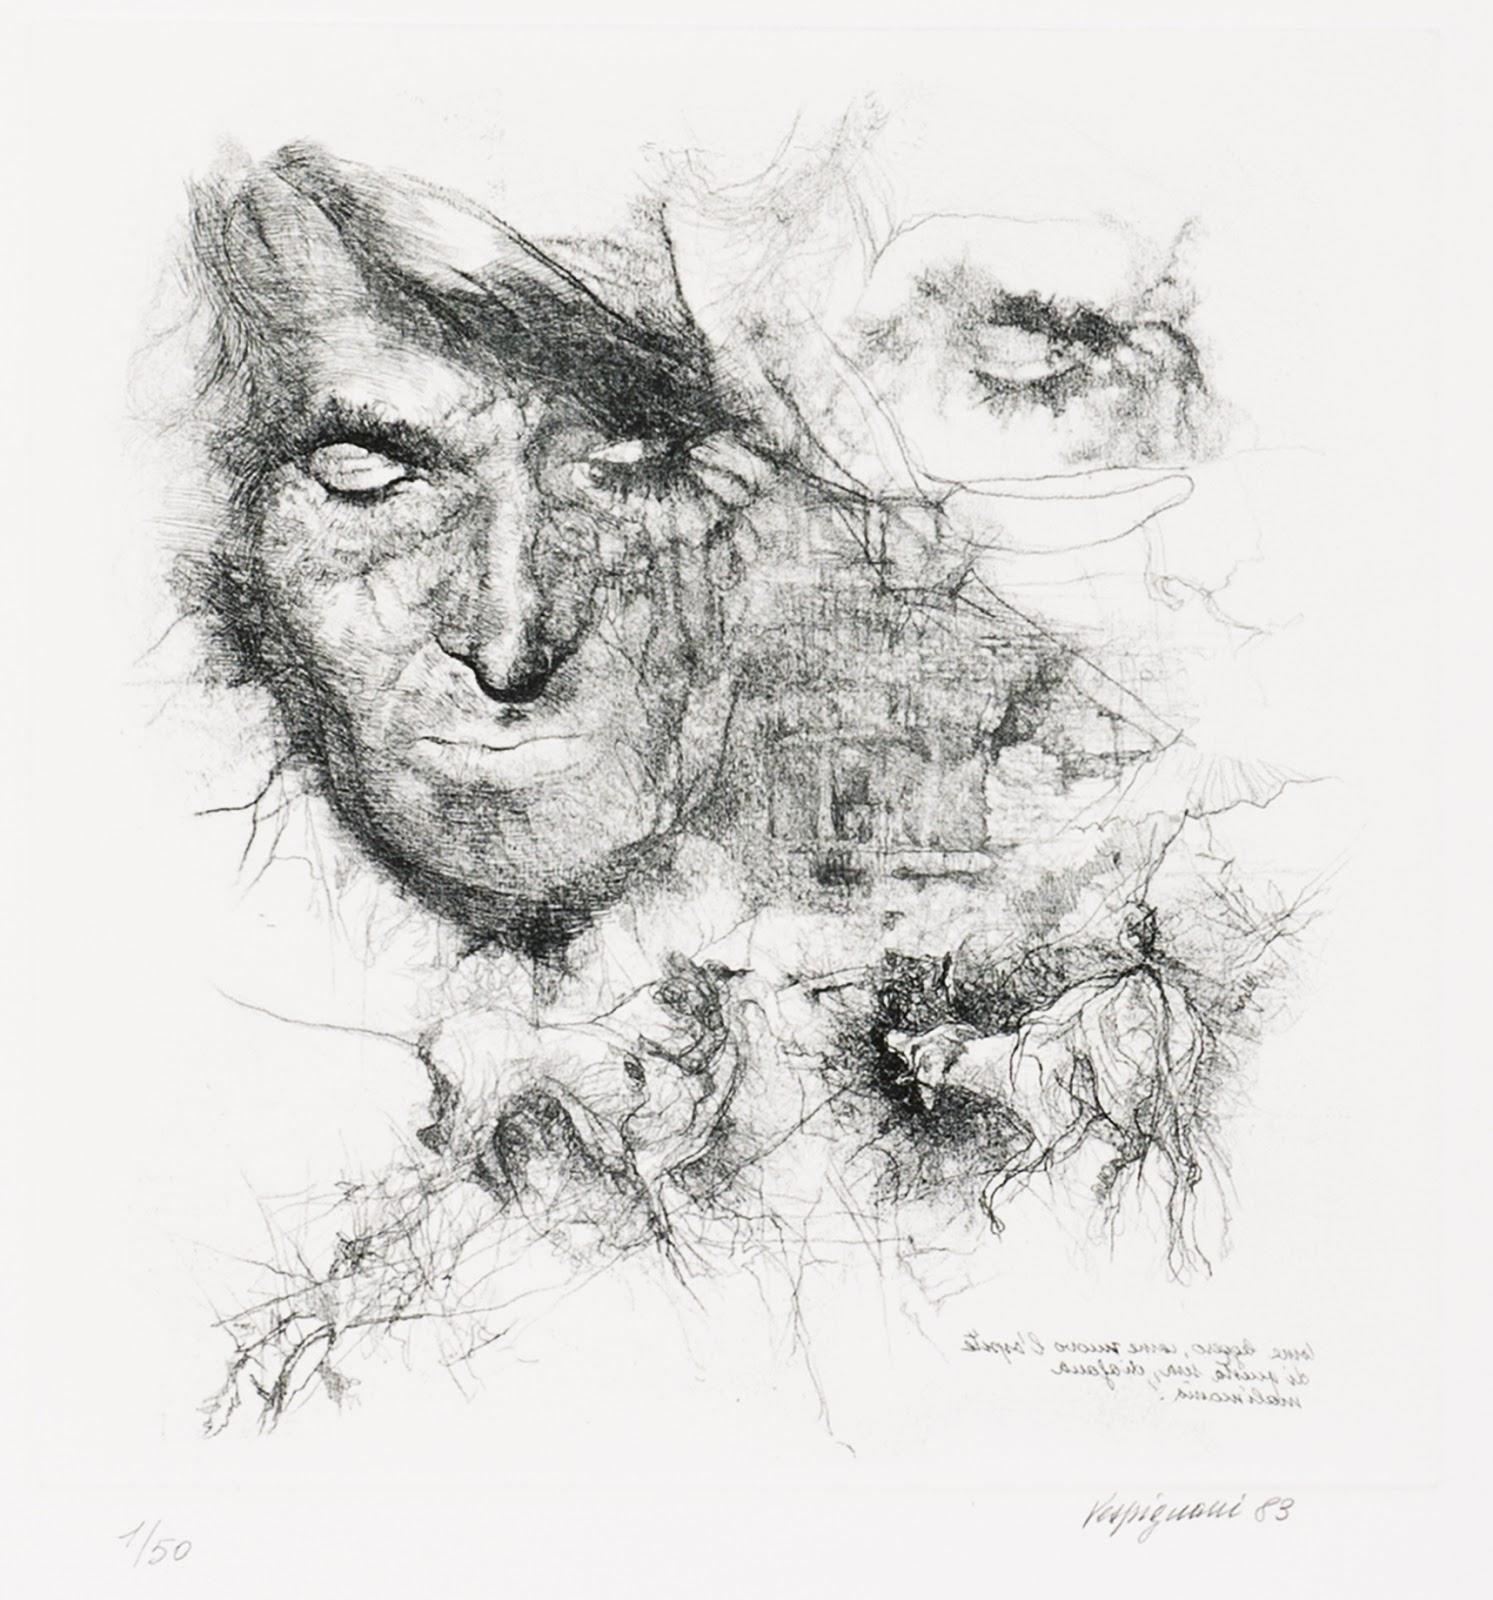 Neorealism: Expressionist Painter